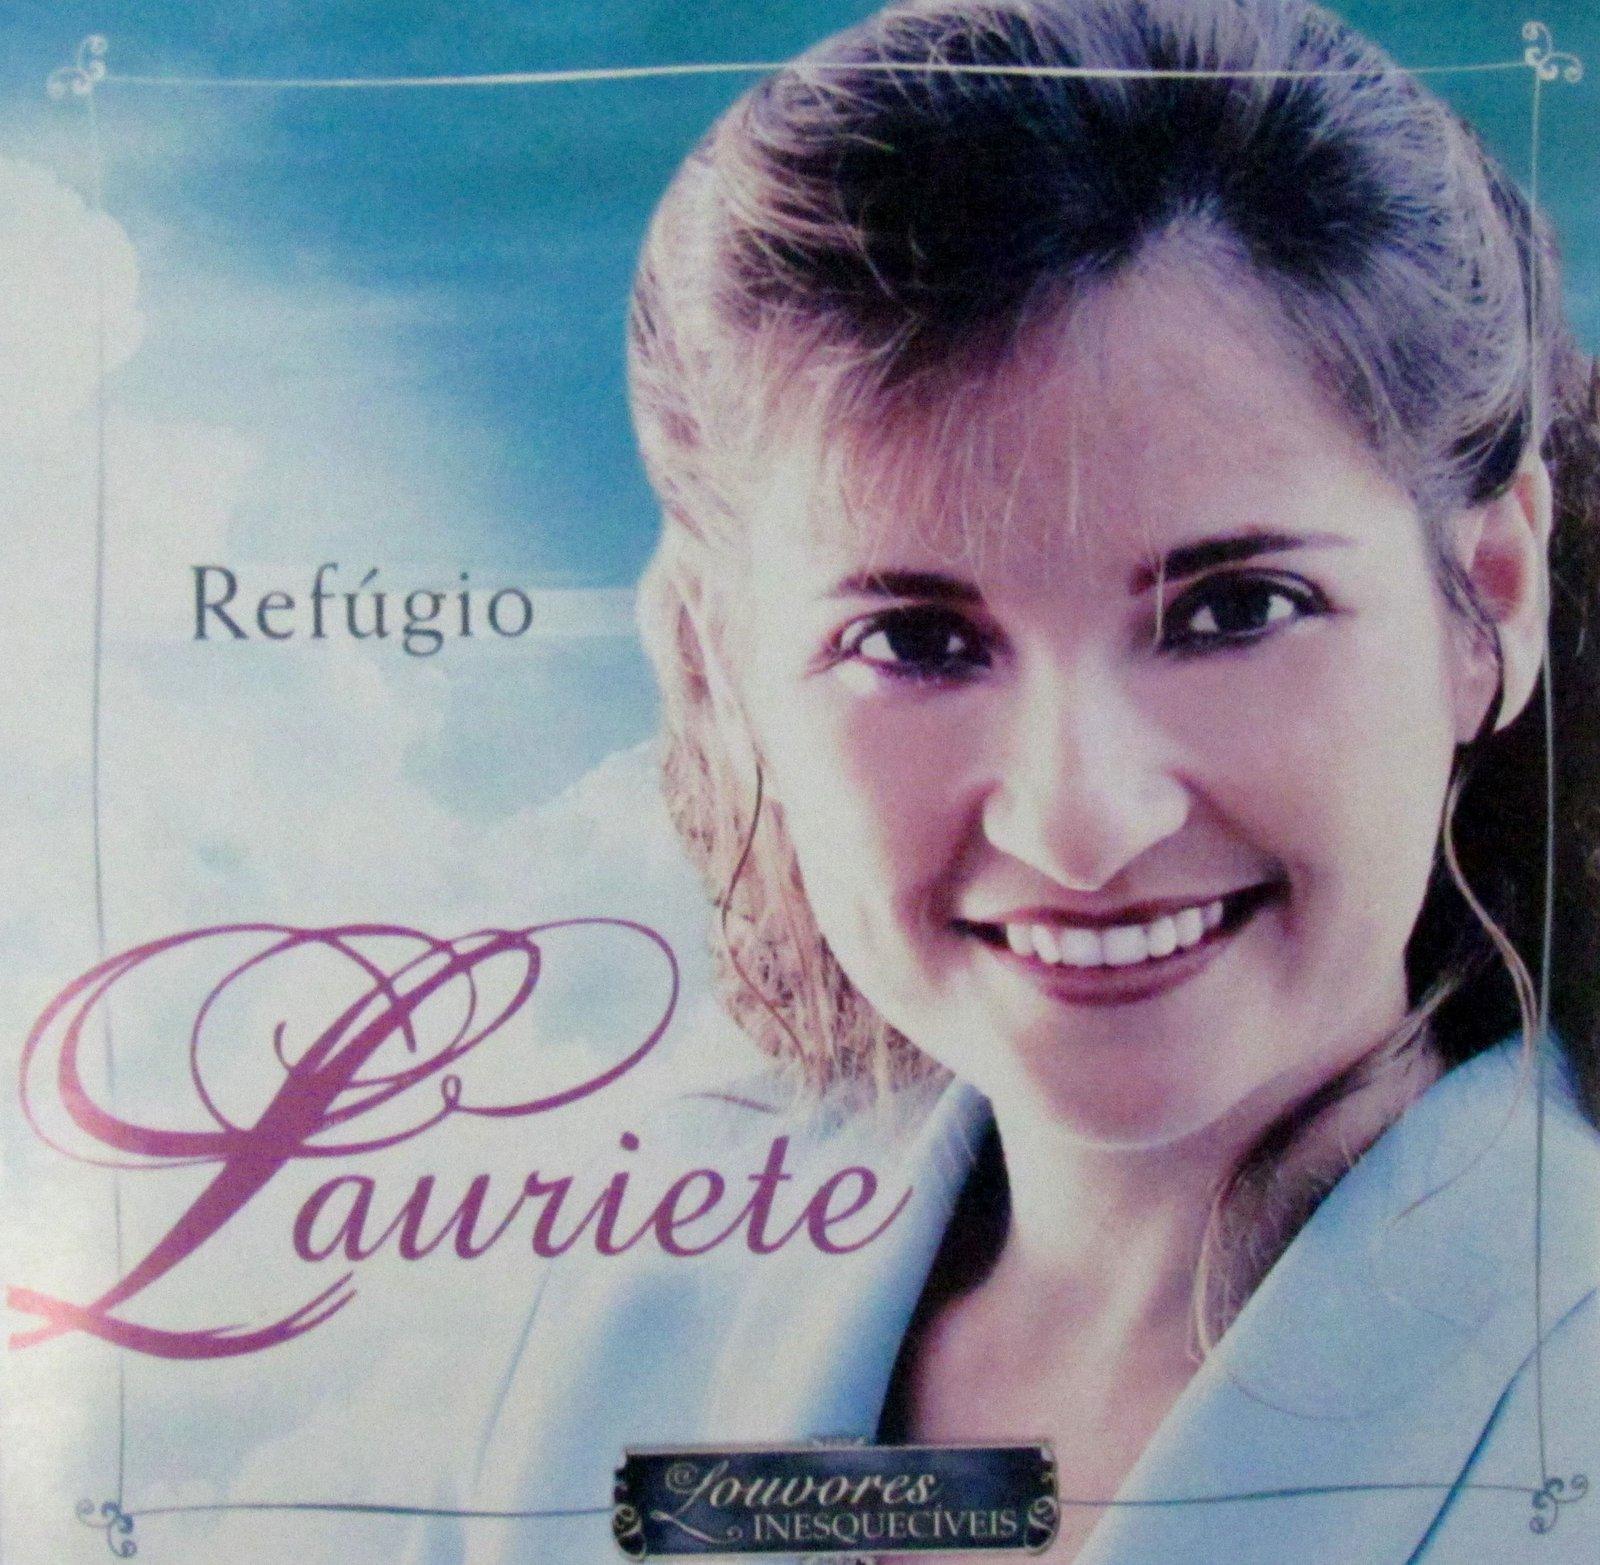 GRATIS TUDO BAIXAR CD DANESE NOVO REGIS